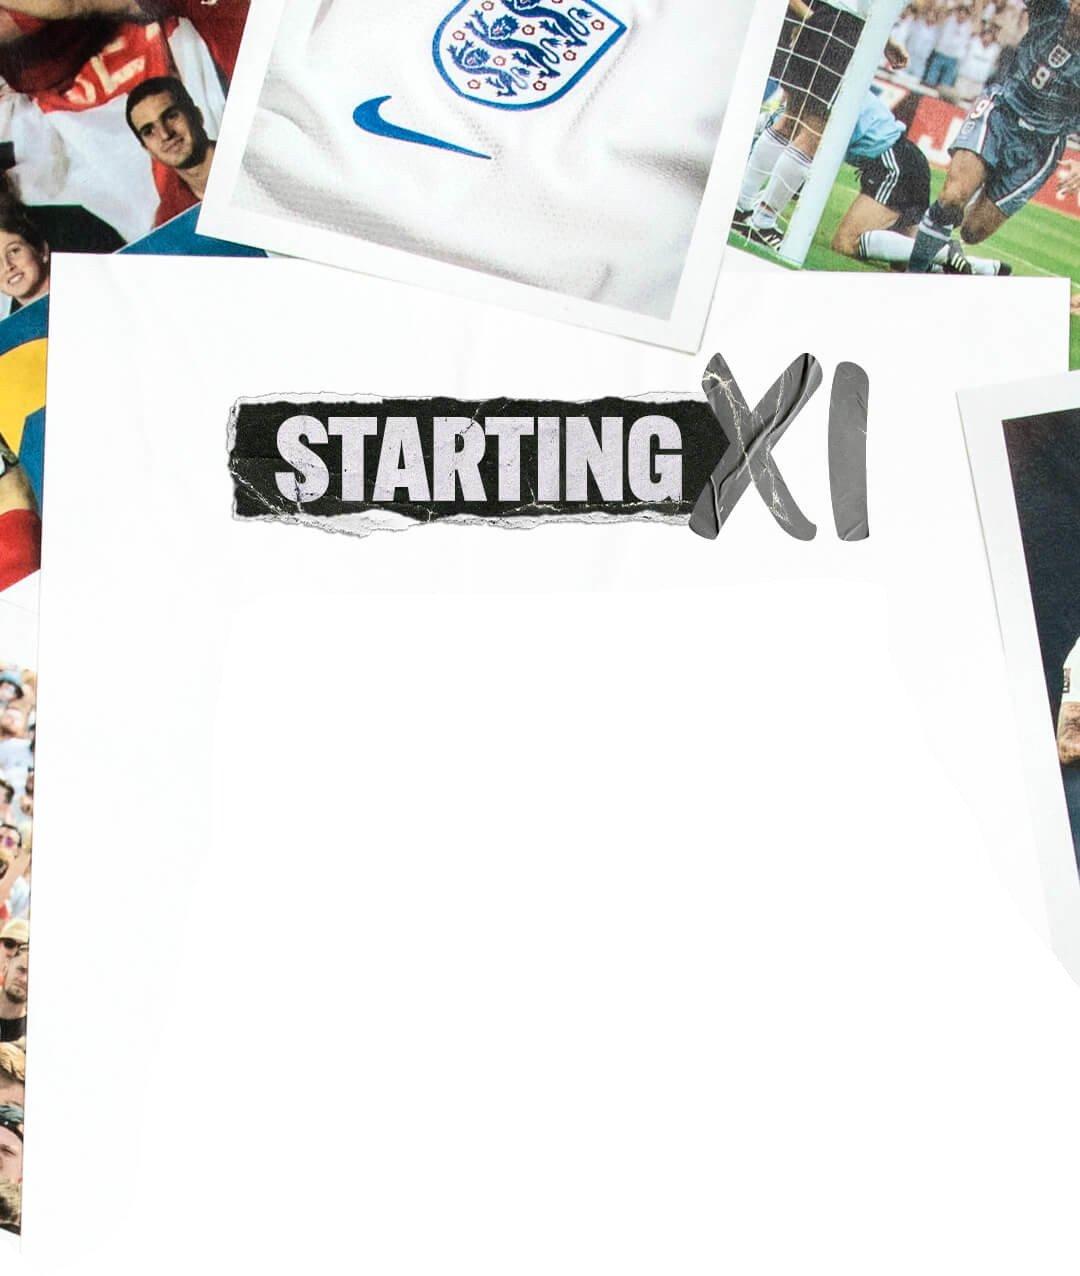 The Stating XI header